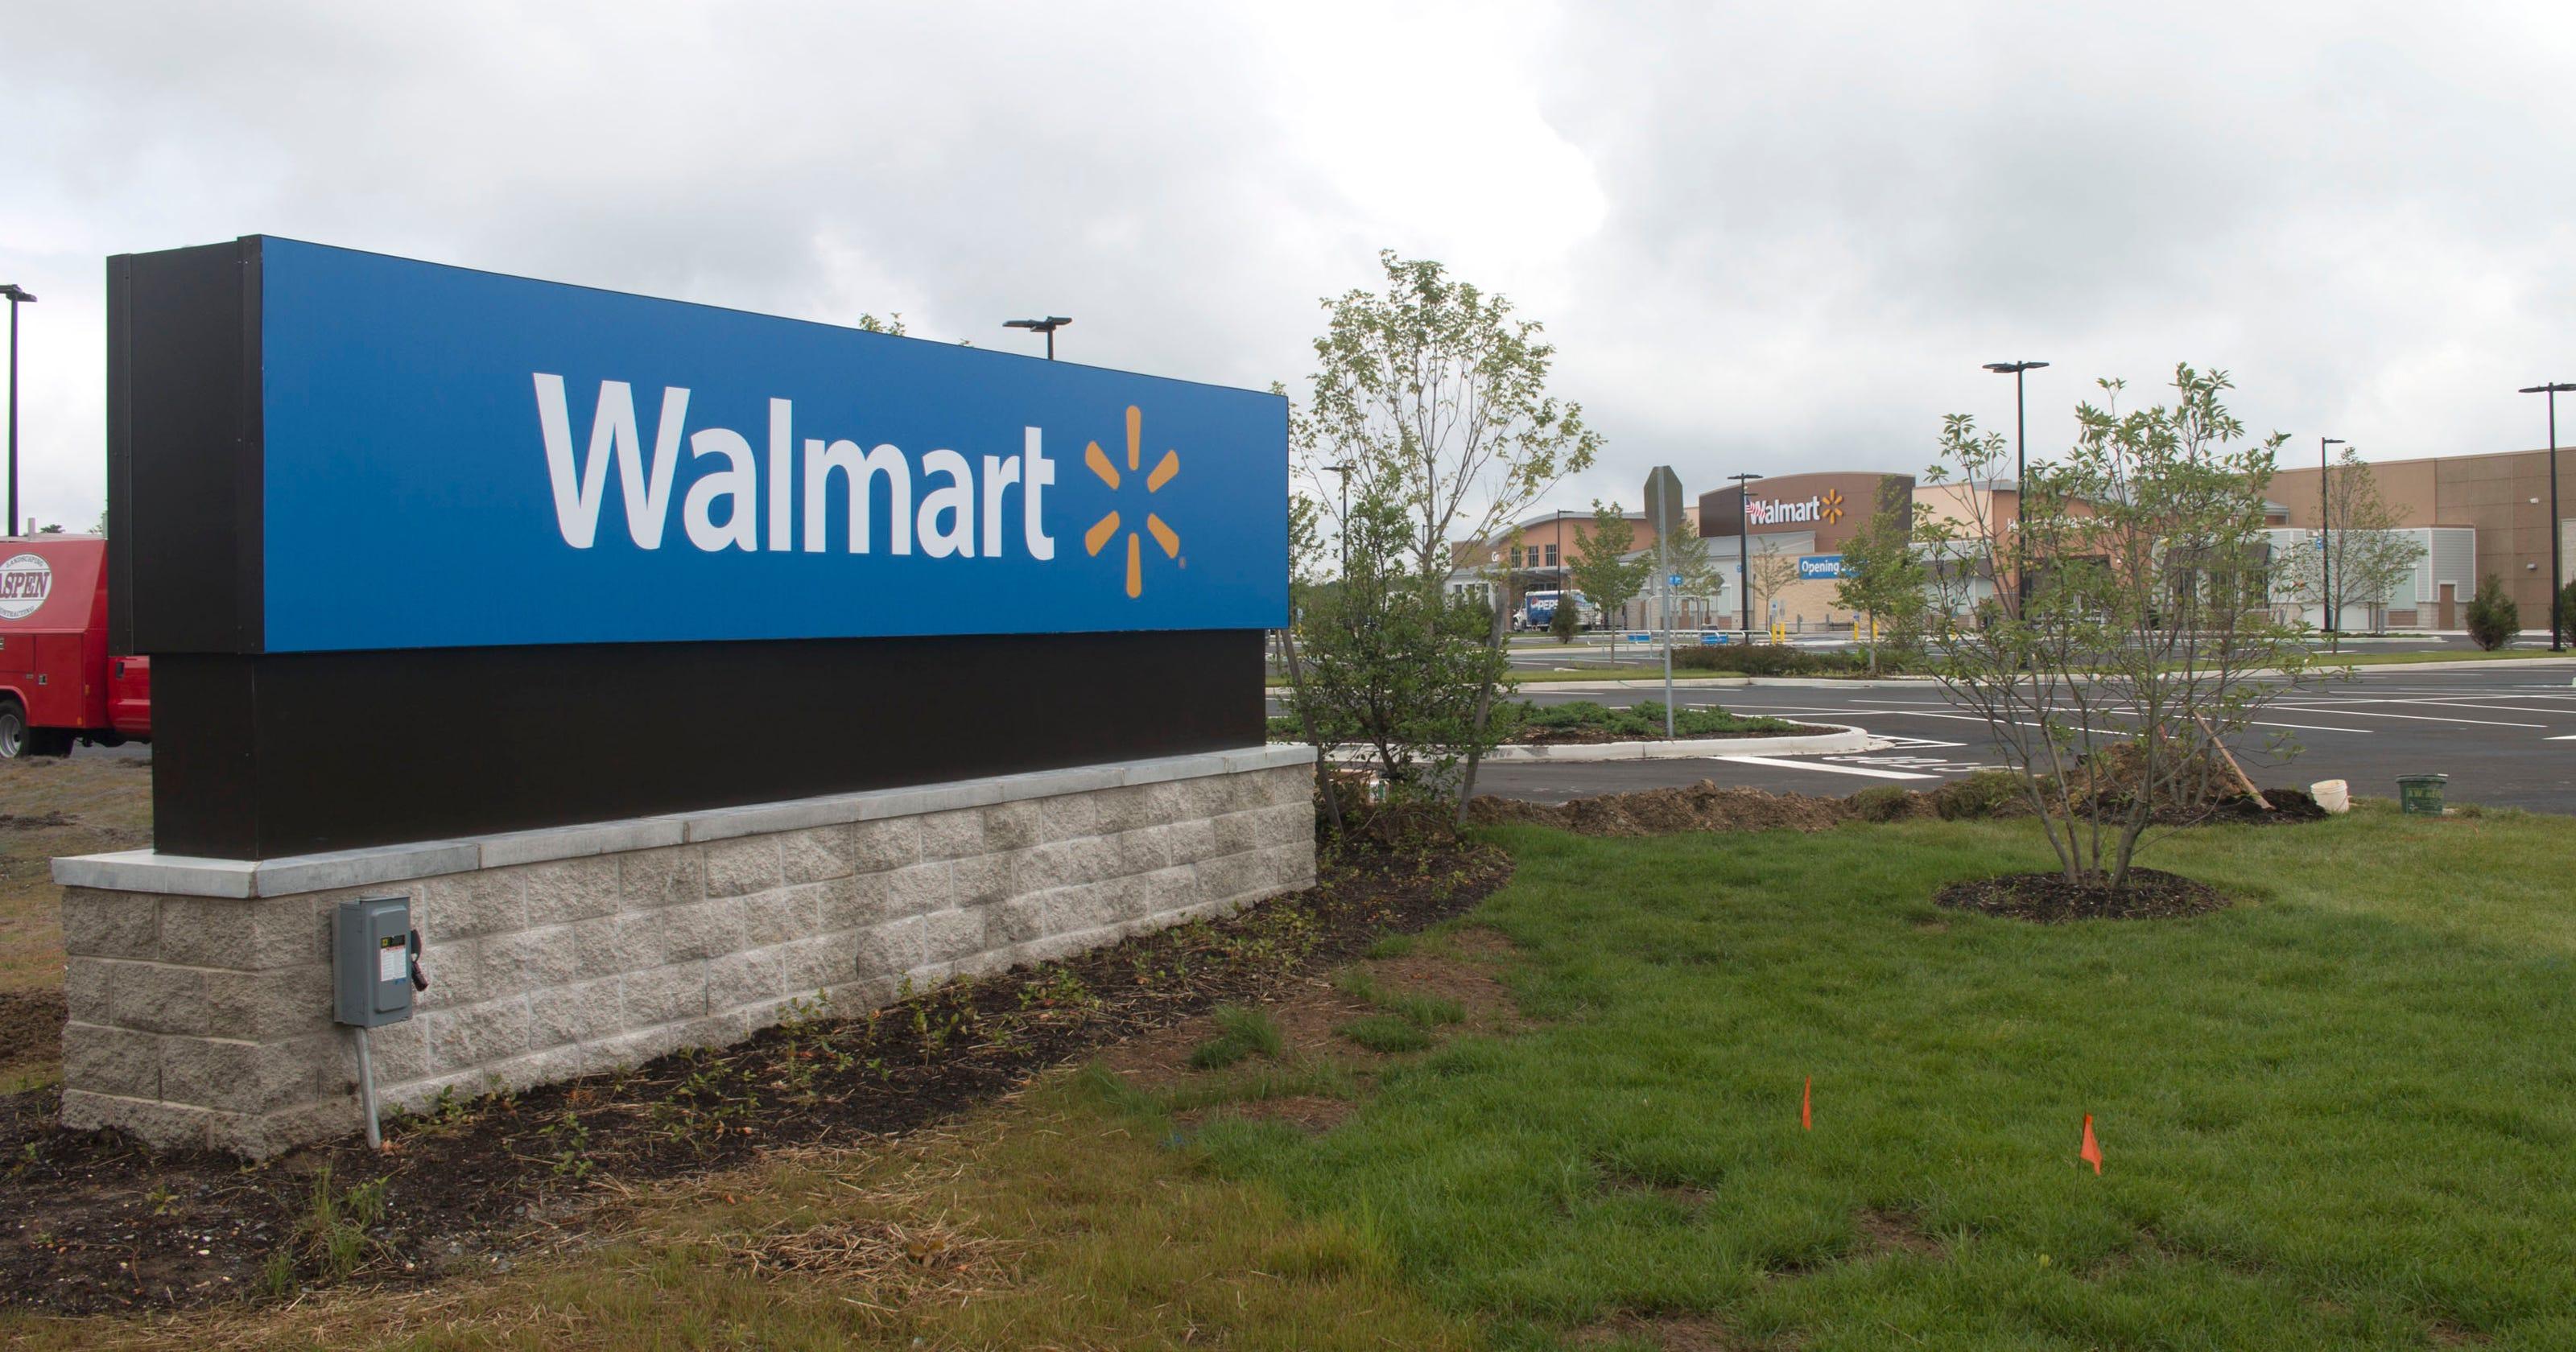 Super Bowl 2015 Shirts Walmart – EDGE Engineering and